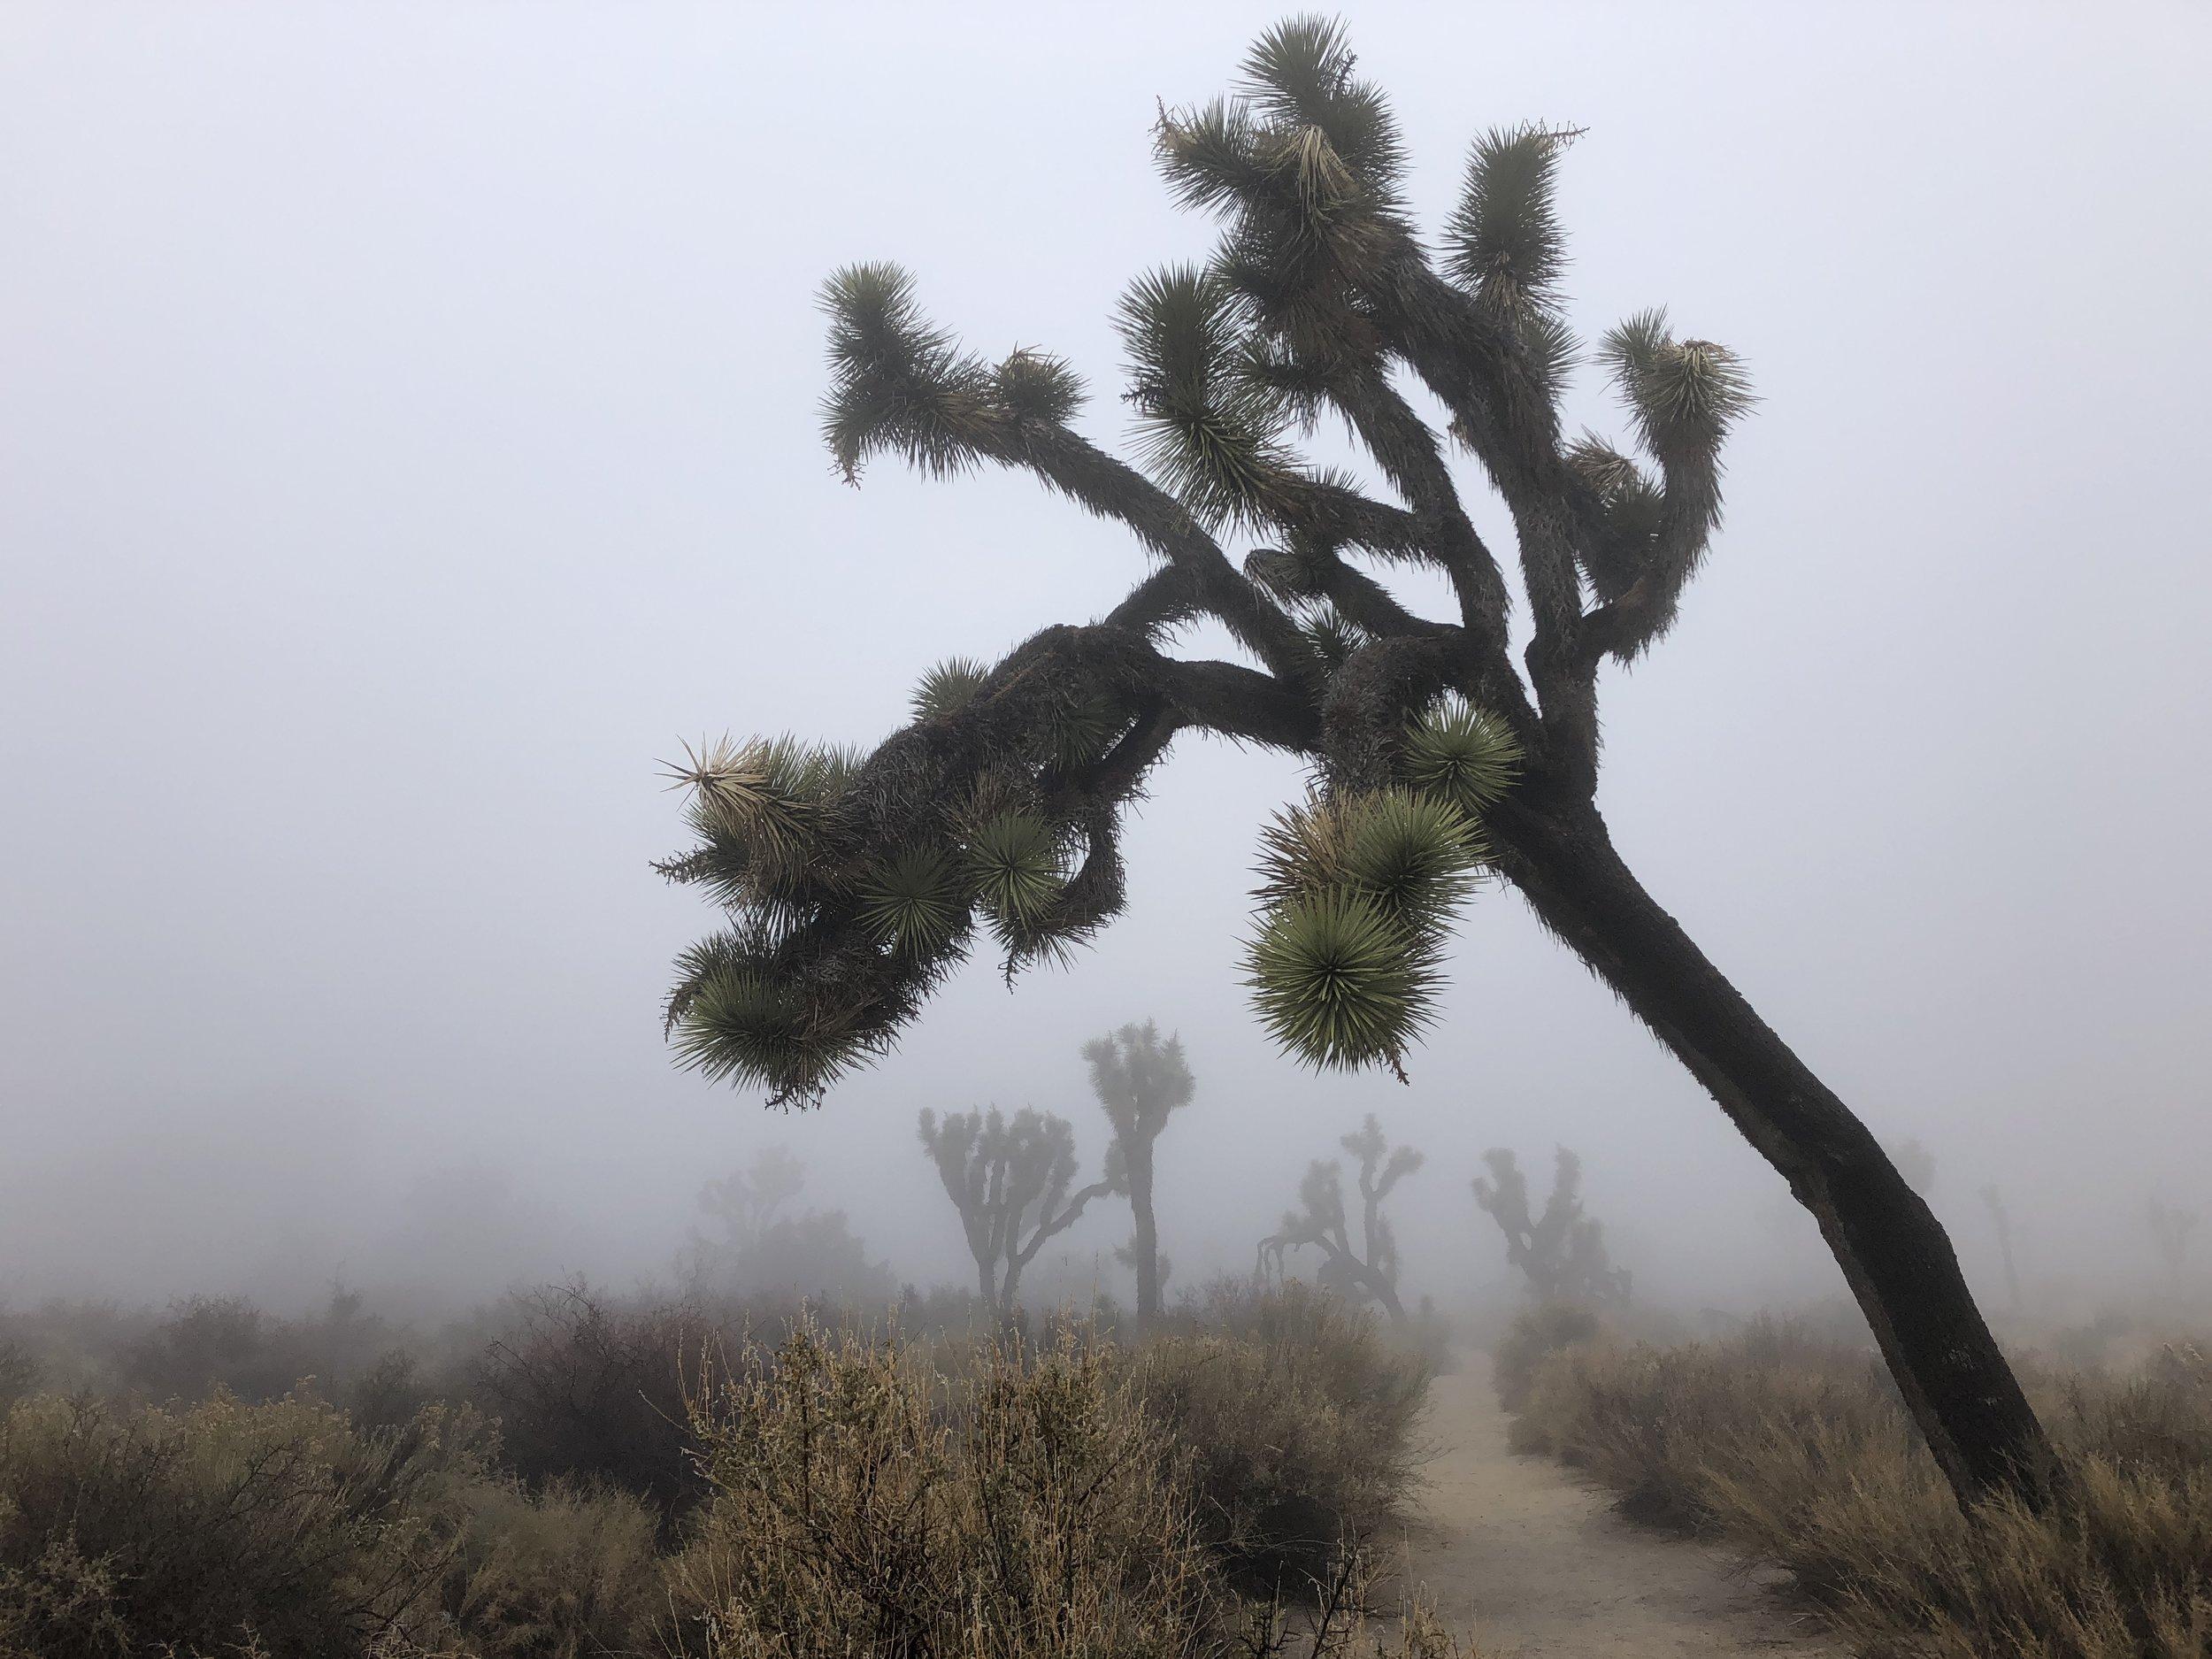 Joshua Tree National Park - magical landscape